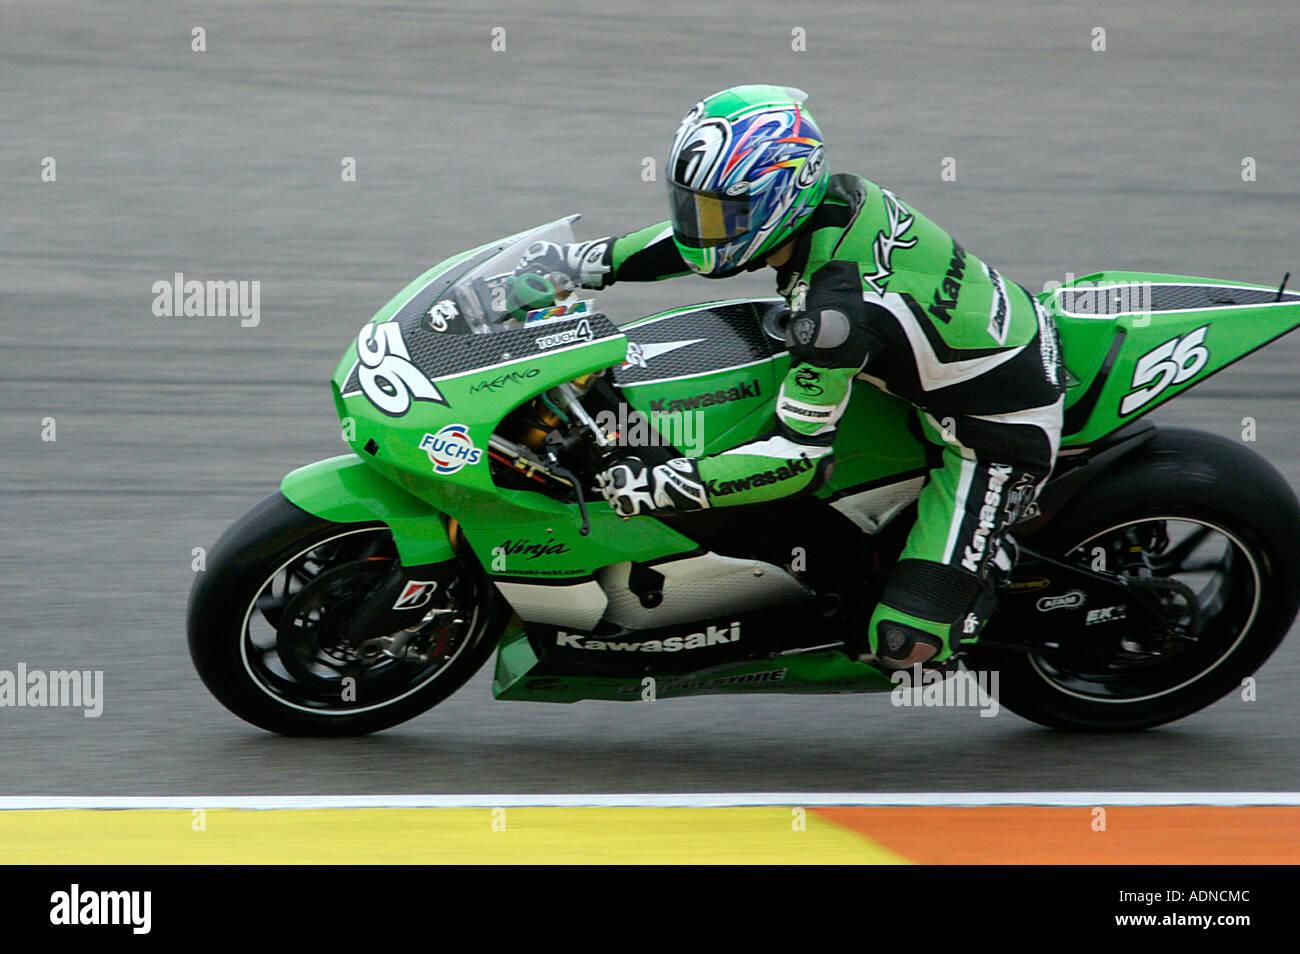 Shinya Kawasaki Rider High Resolution Stock Photography And Images Alamy